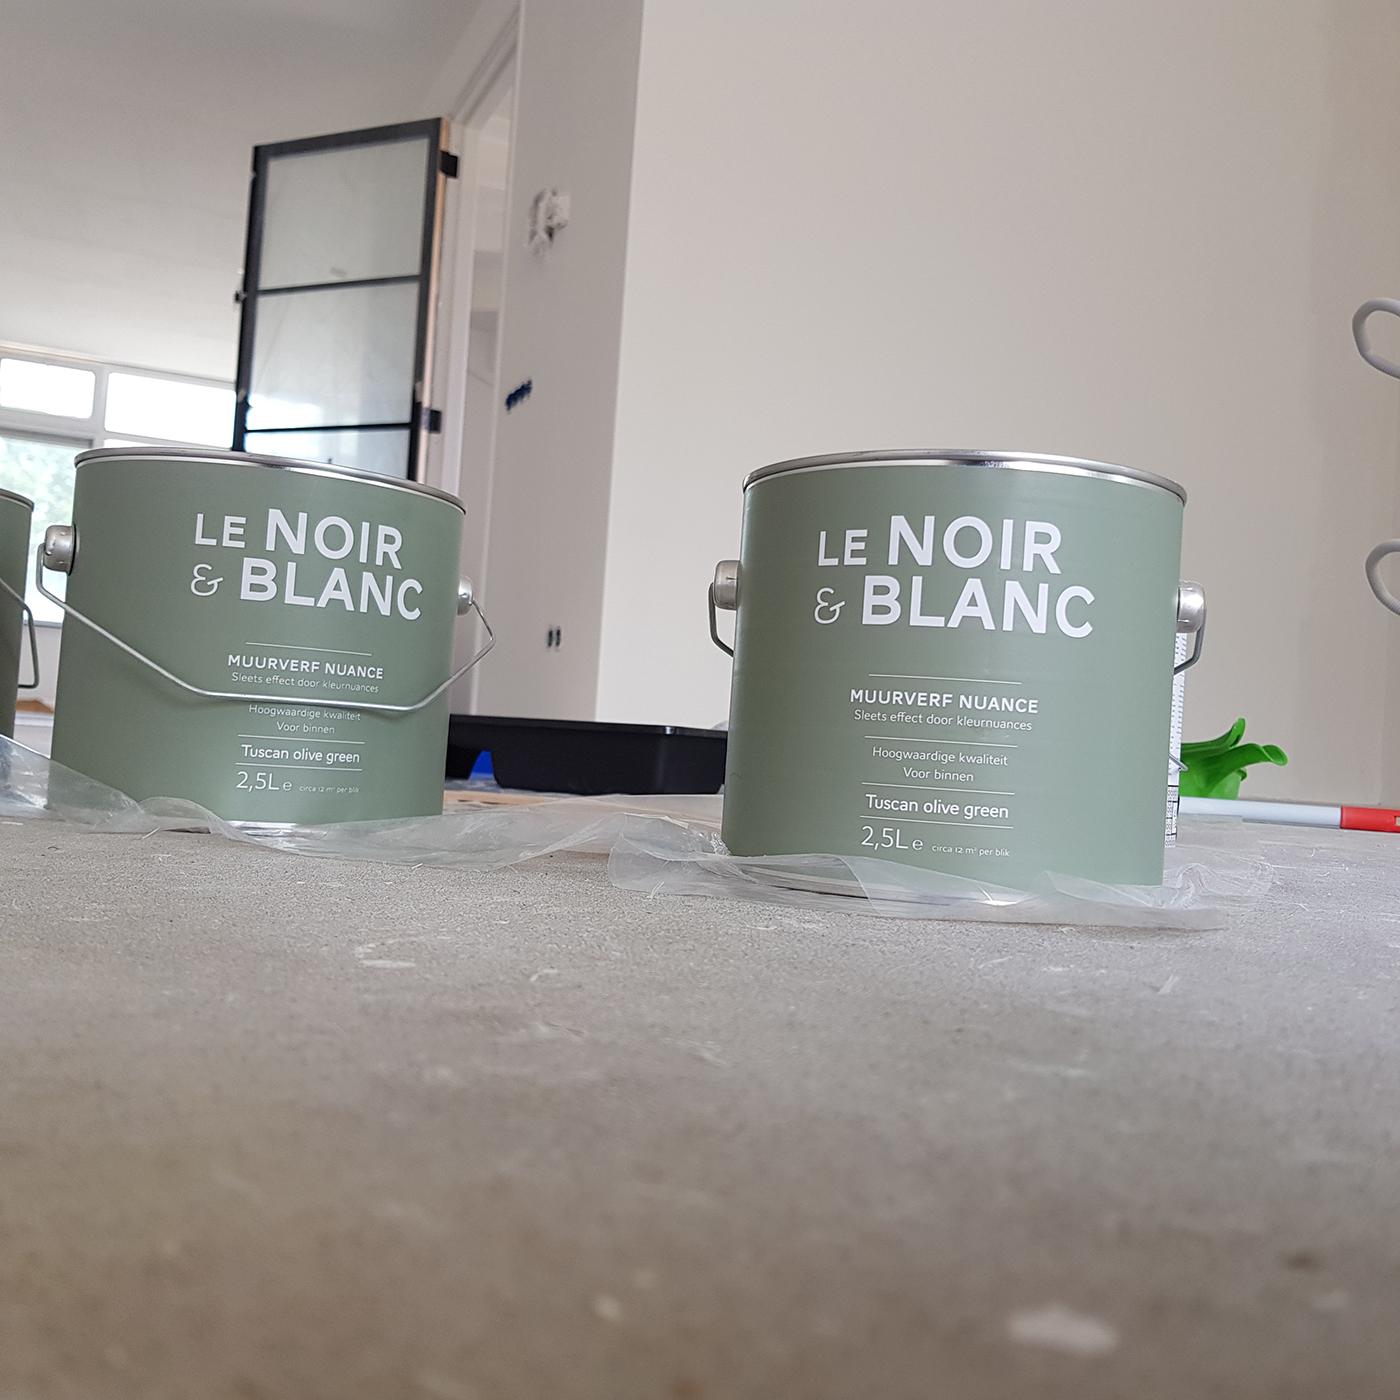 Verven huis met Le noir & Blnac